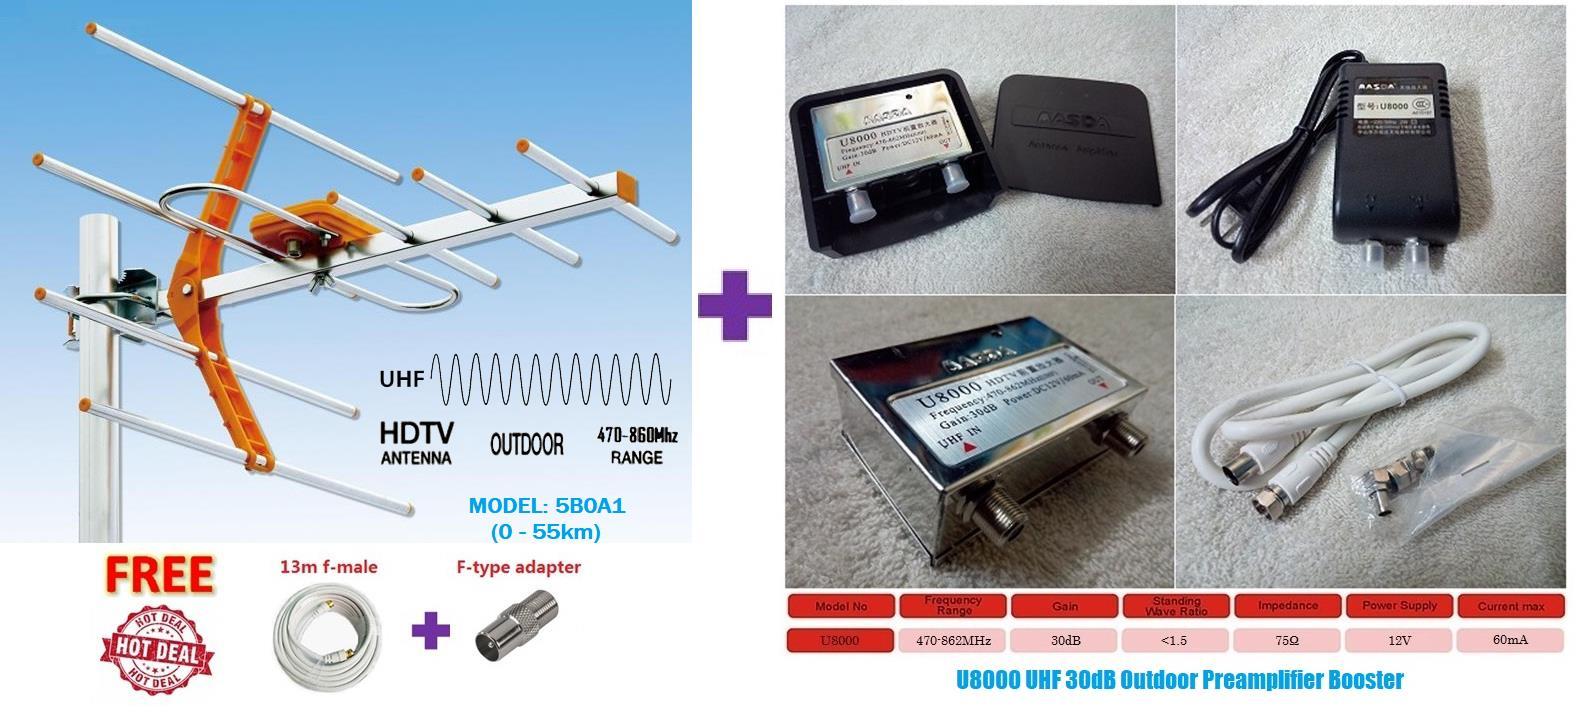 HDTV Analog & Digital TV Signal UHF Amplifier Filter Booster 30dB